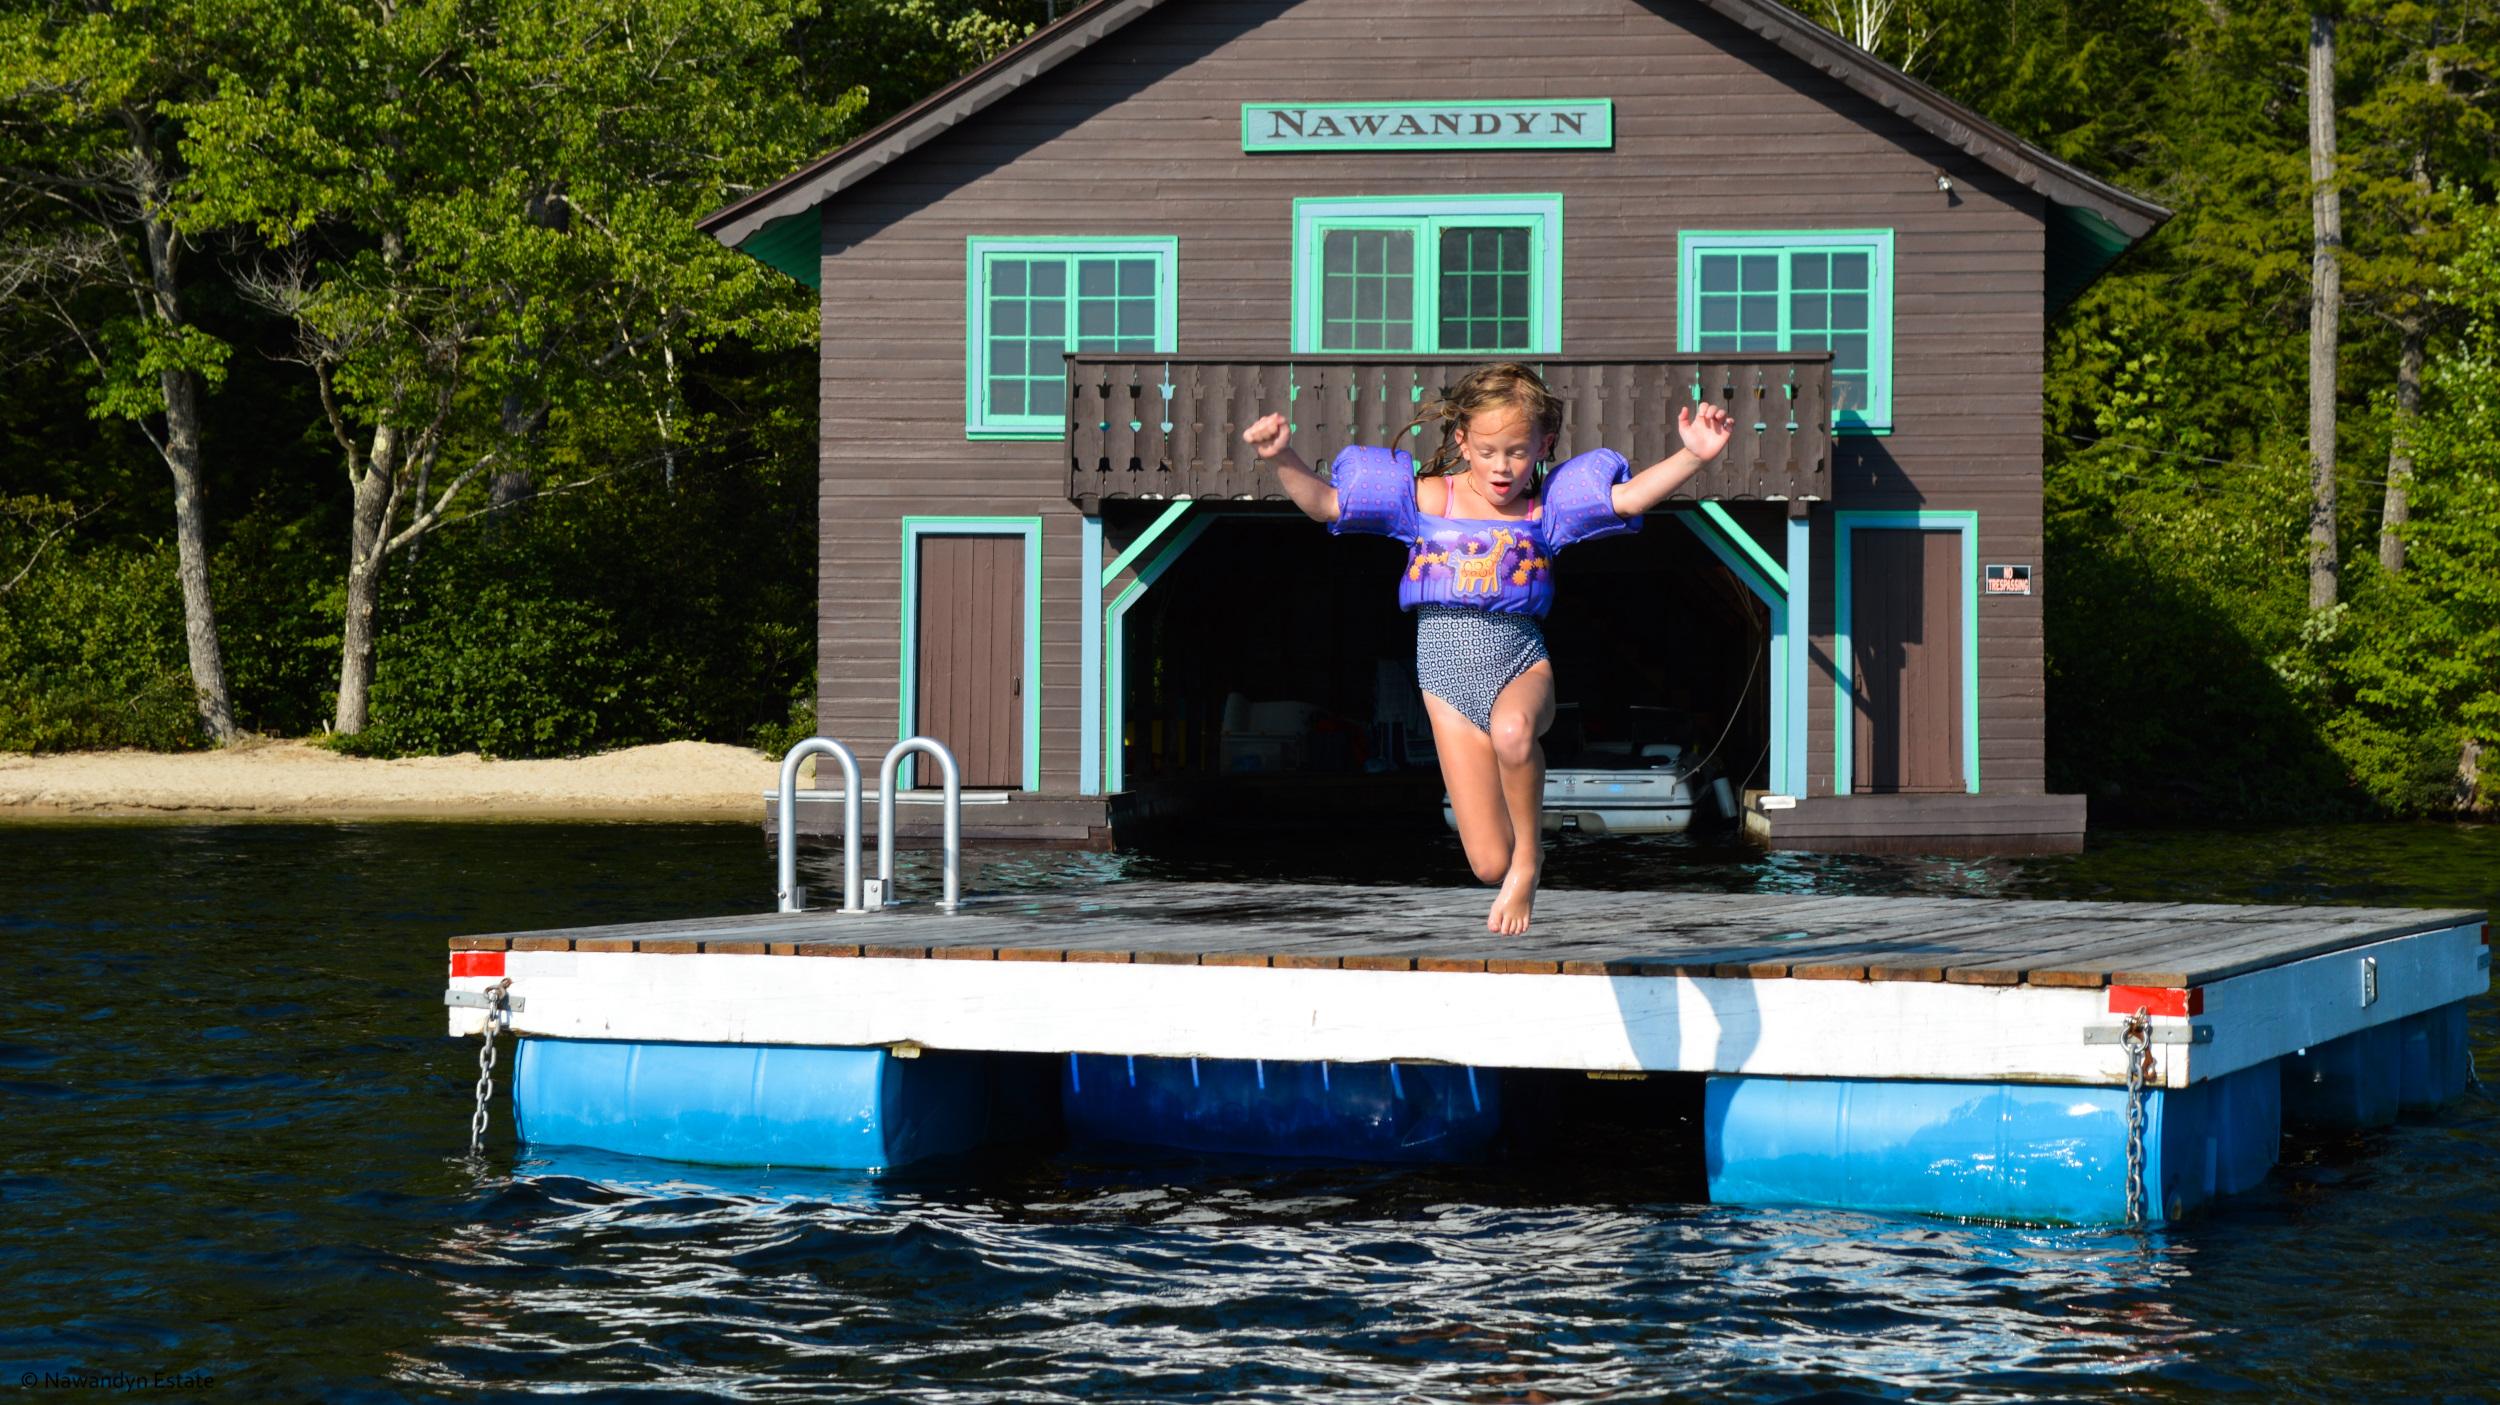 Sheer Joy -- jumping into warm, clear Highland Lake